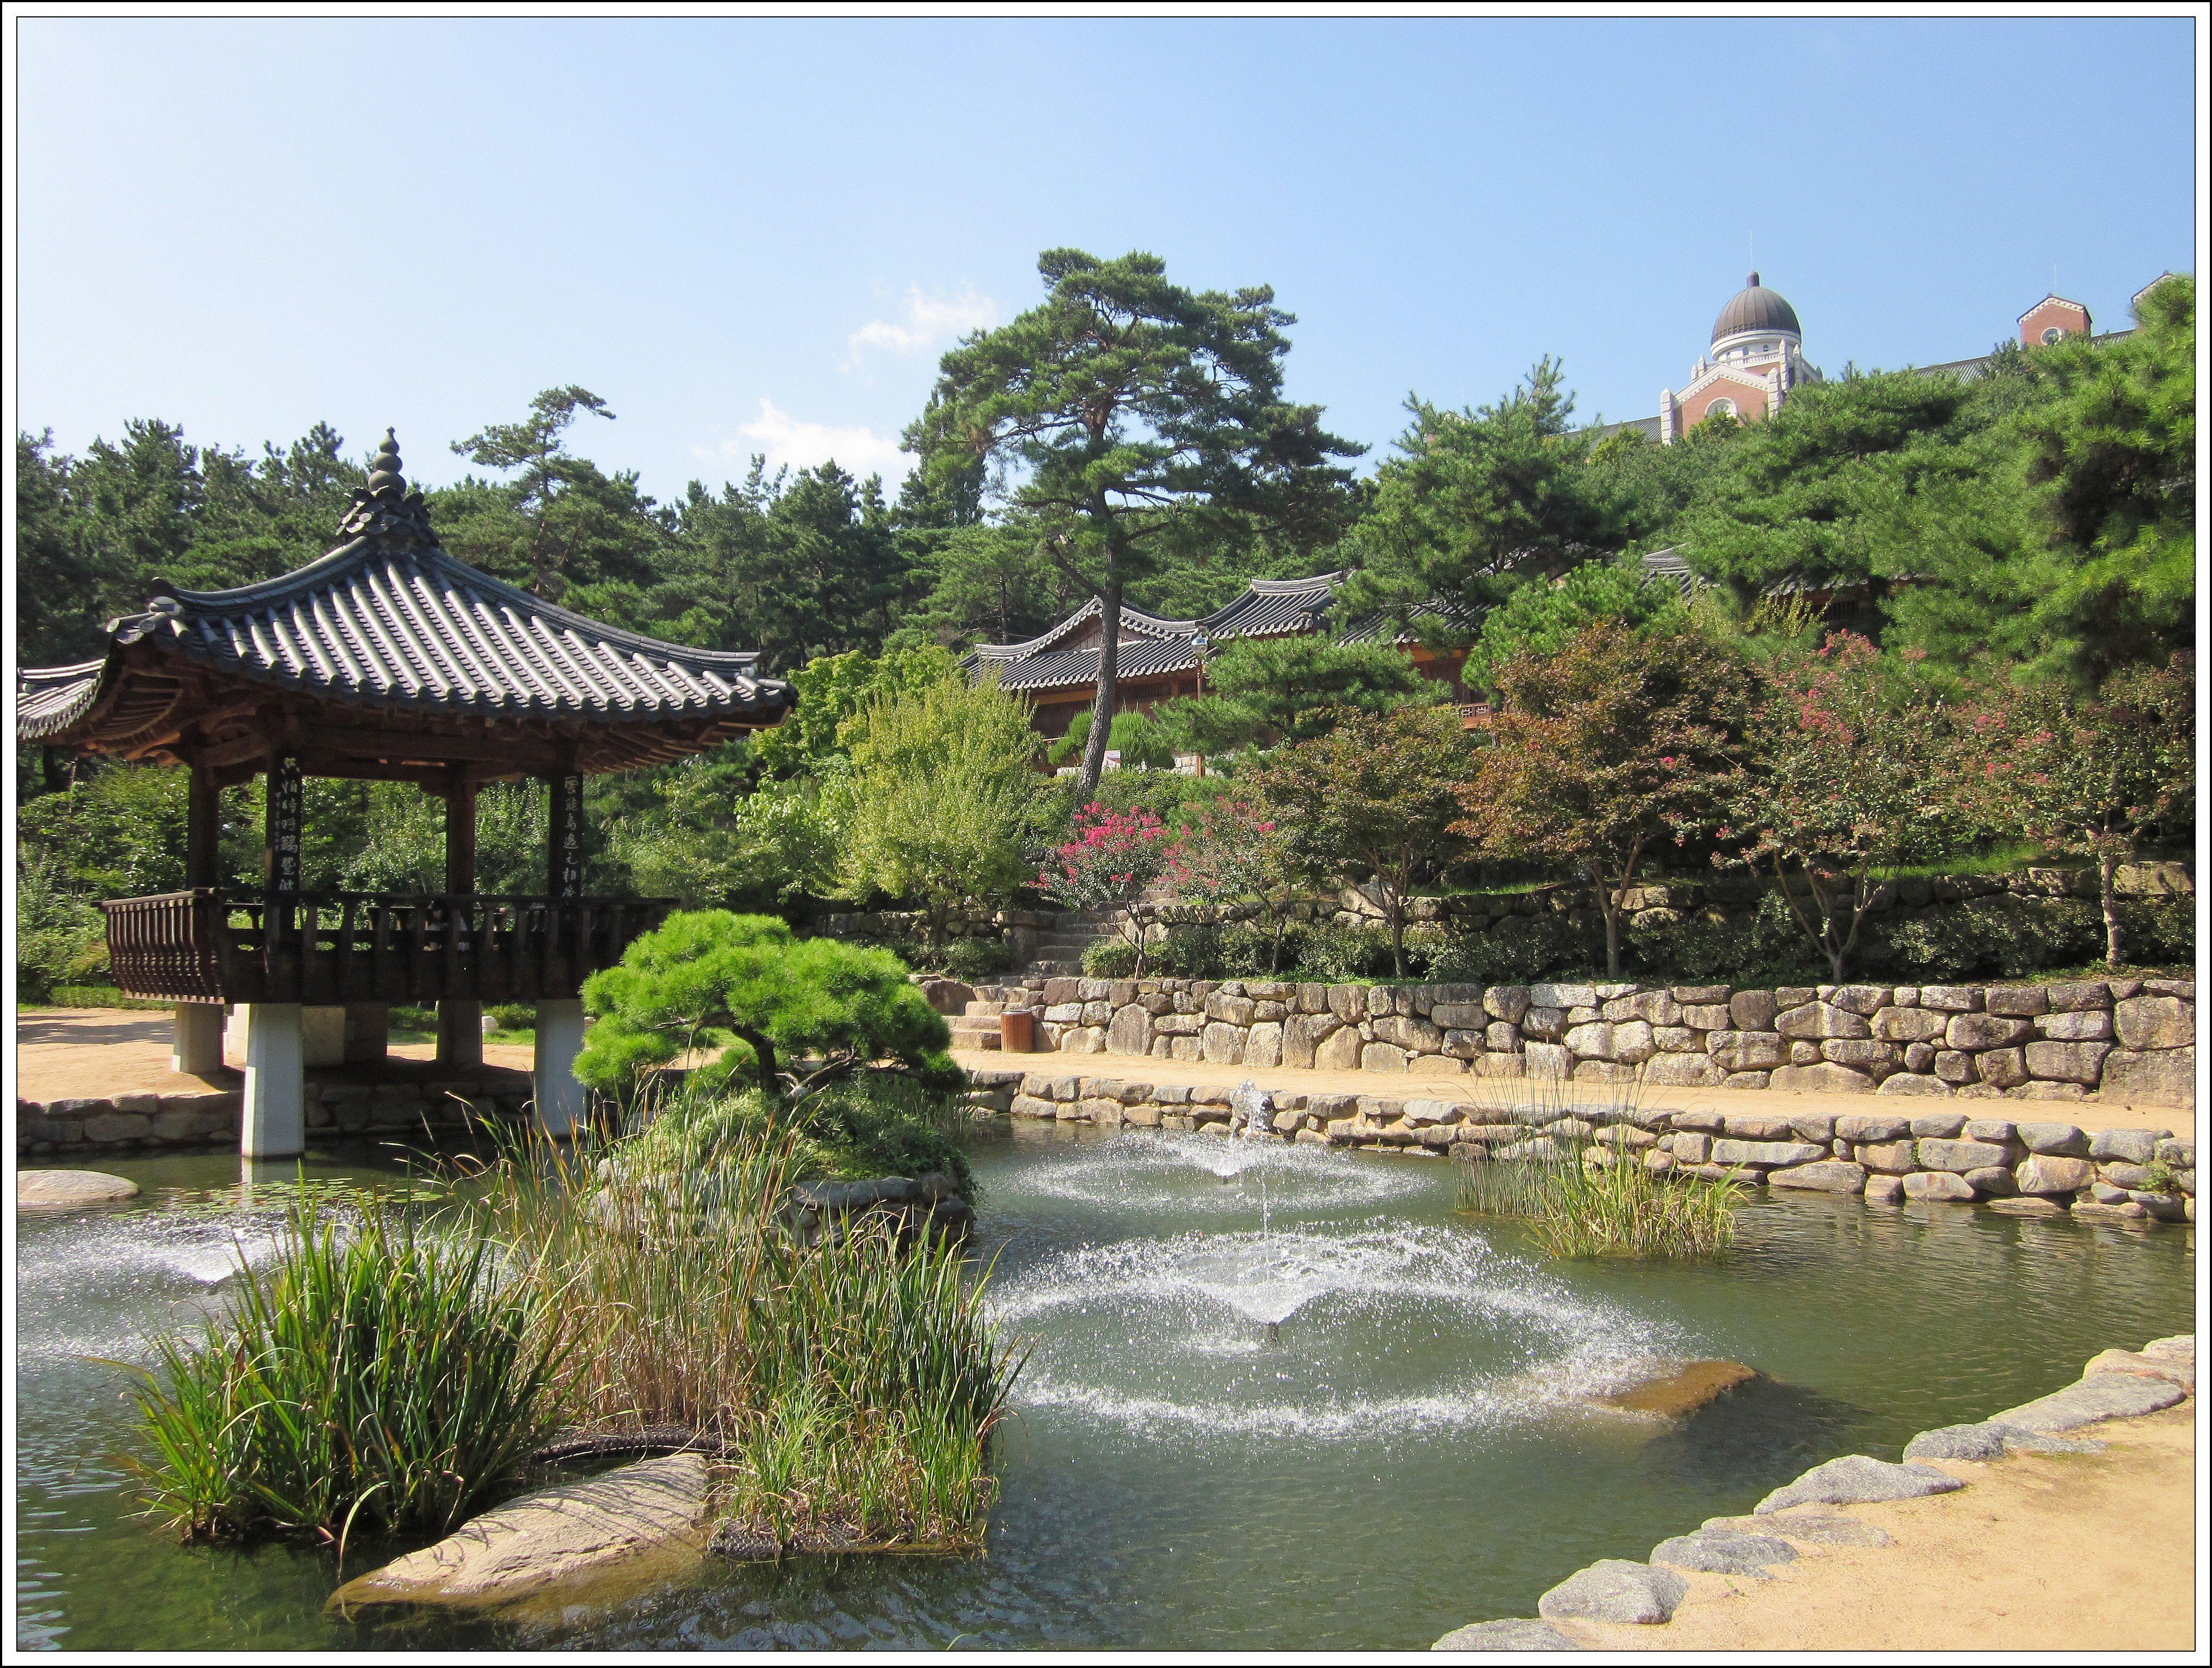 file:october seoul corea - asia photography 2013 traditional